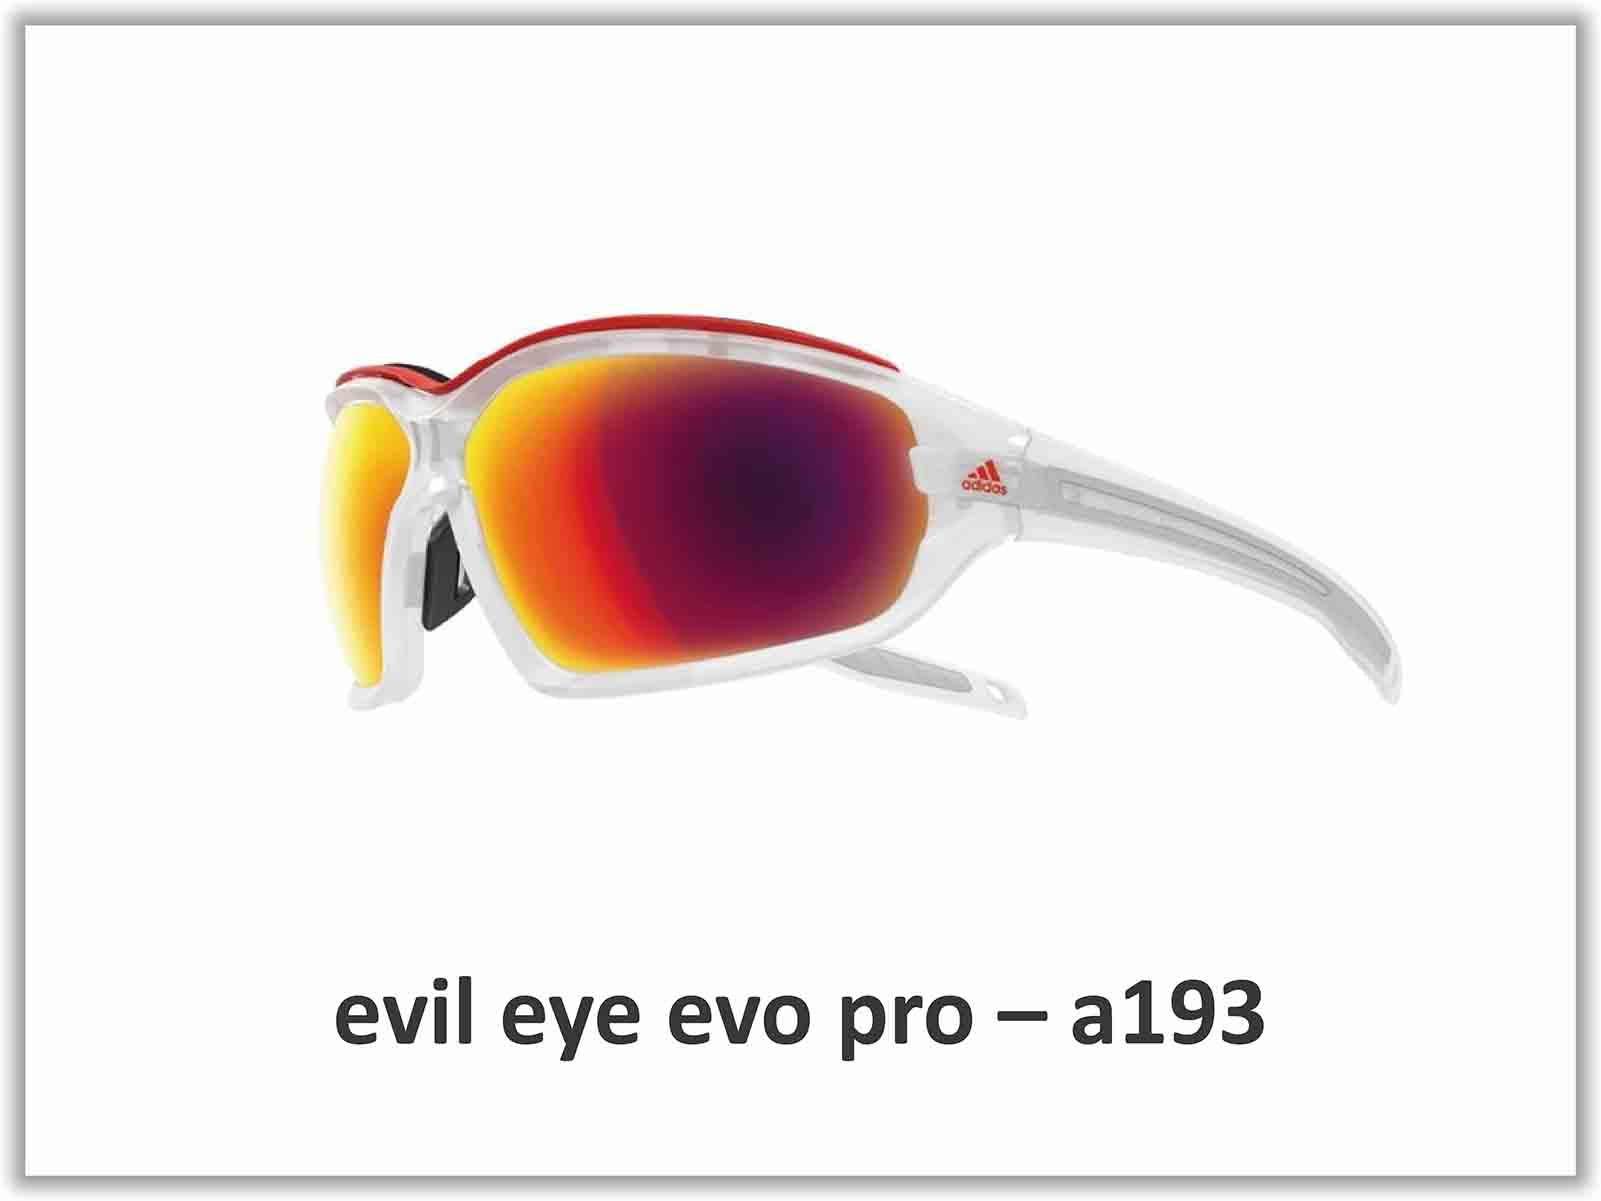 evil eye evo pro – a193